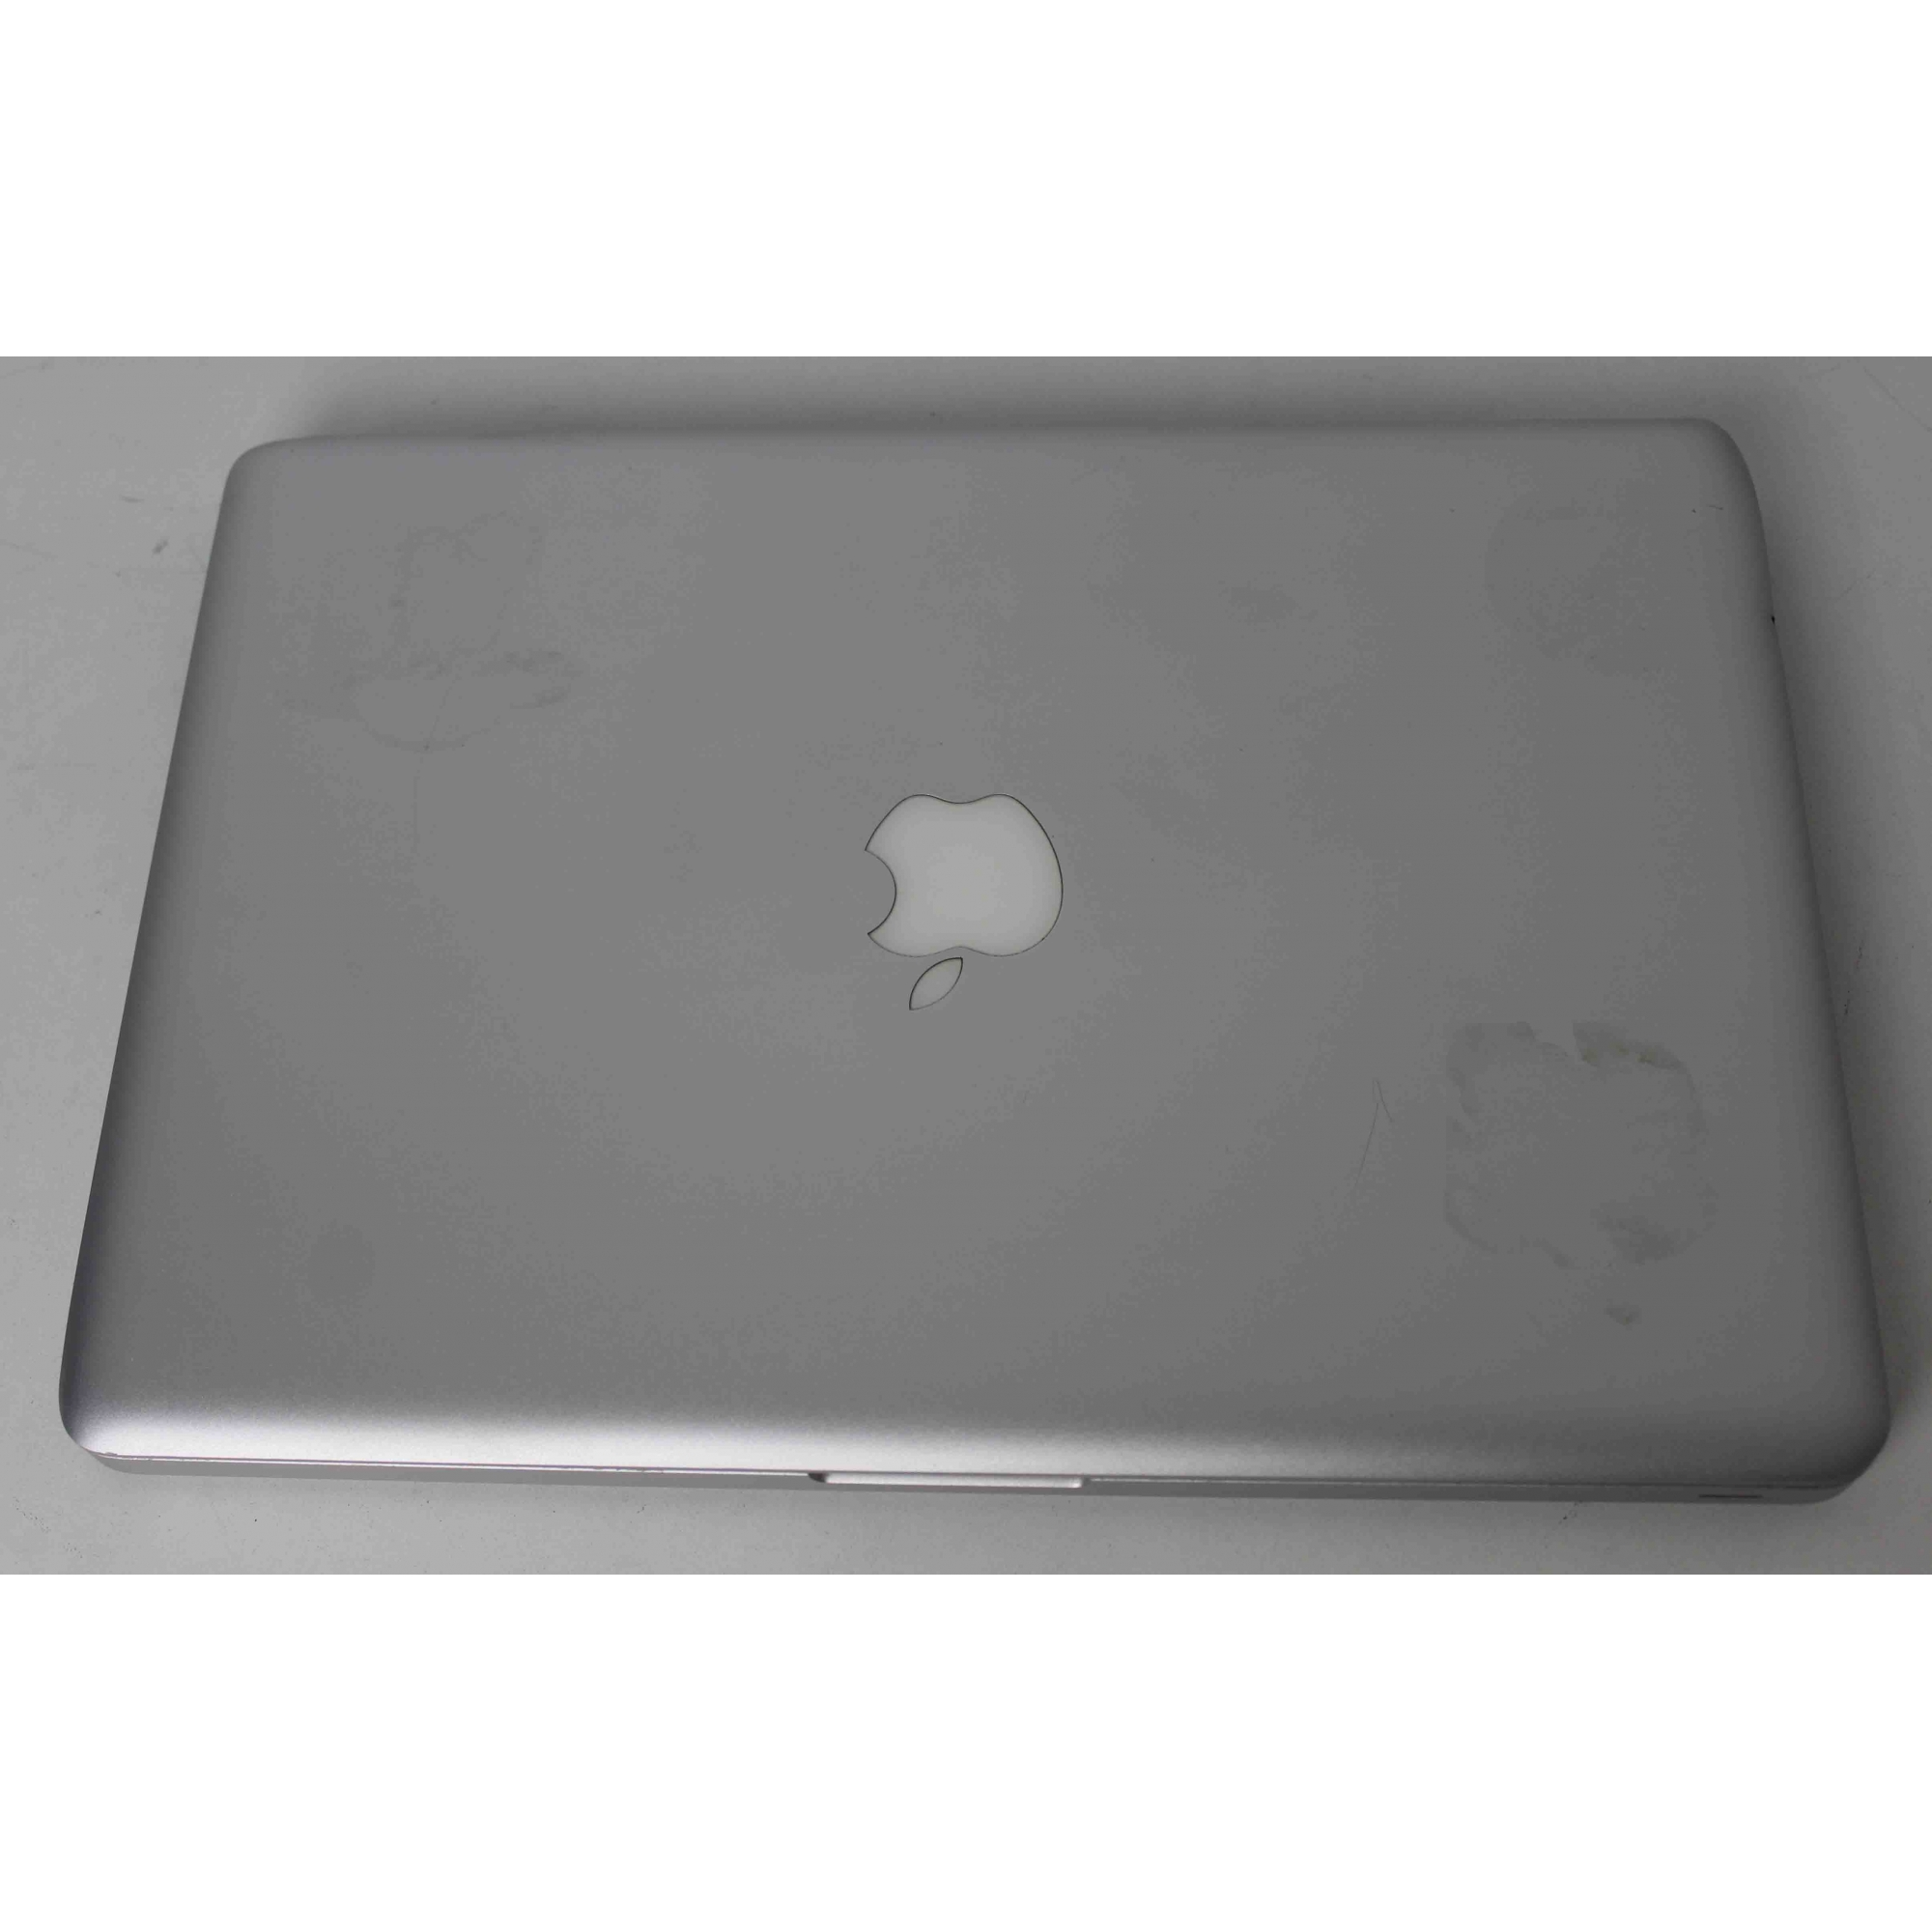 "Macbook Pro MC700BZ/A 13.3"" Core i5 2.3GHz  8GB HD-500GB"